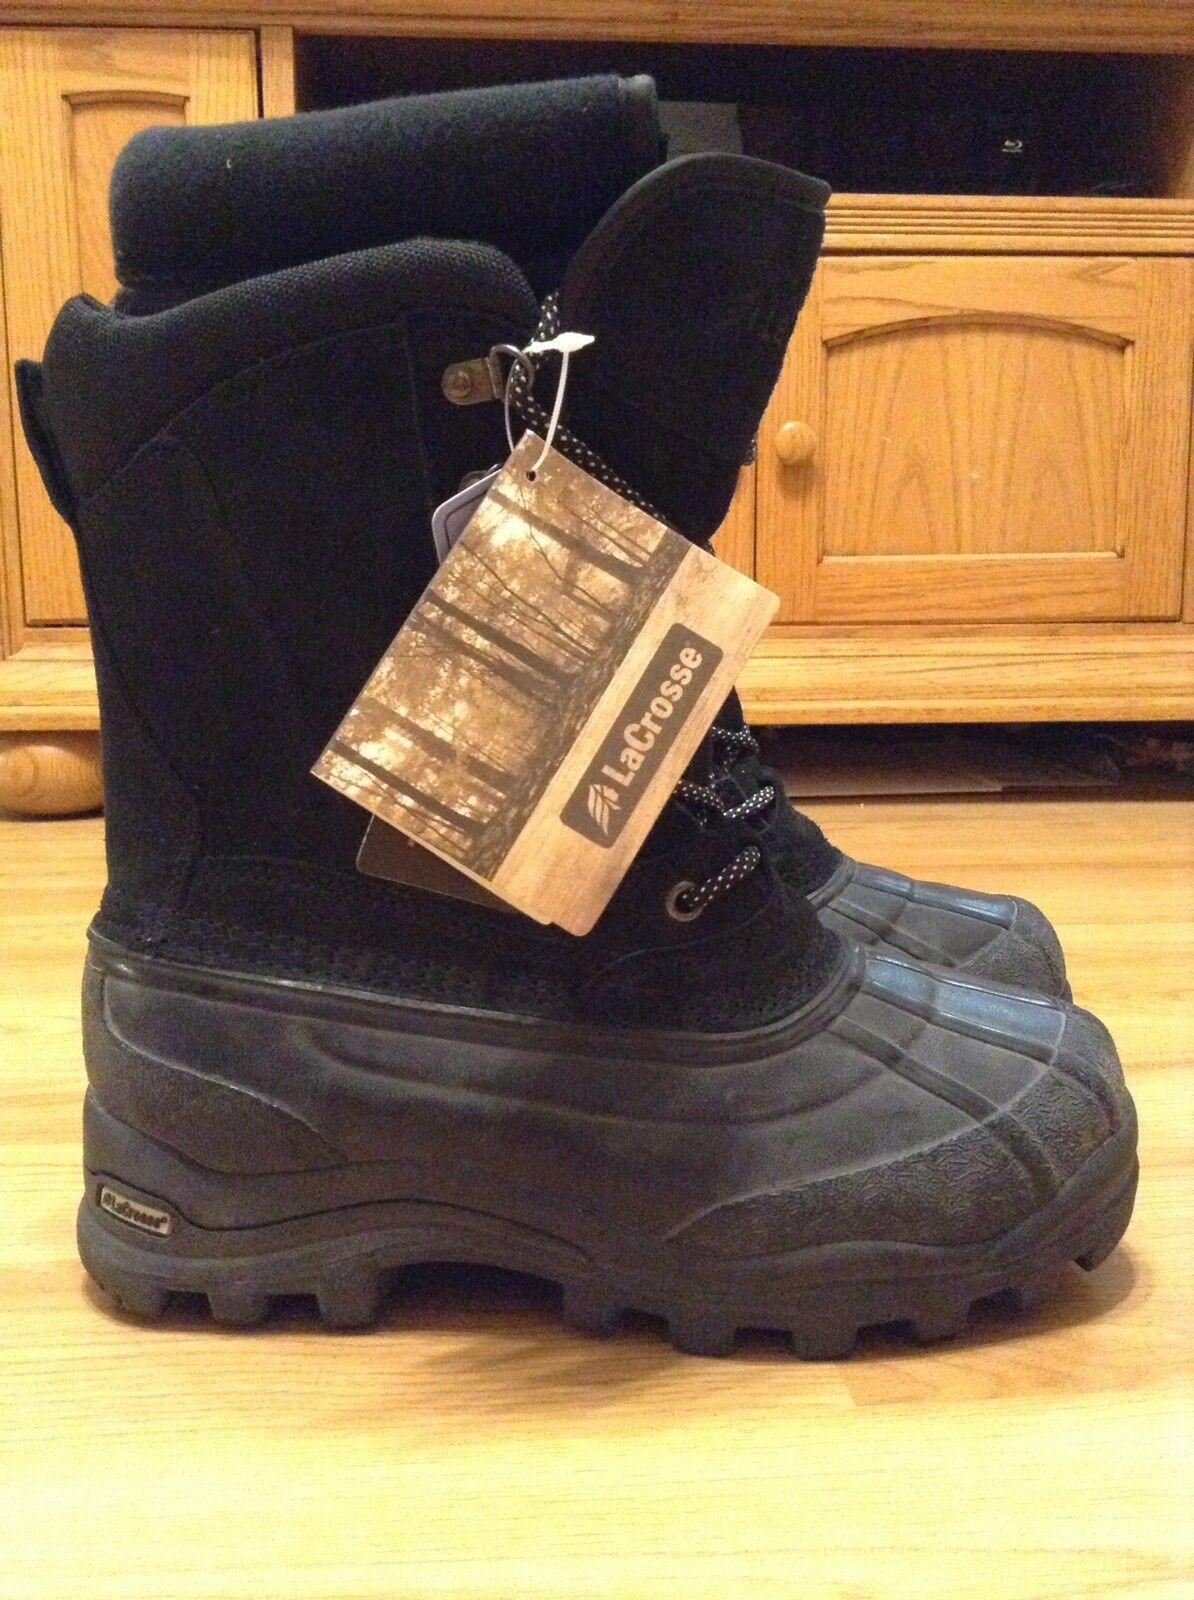 Nuevo Para hombres LaCrosse Garrison 11  400g Thinsulate Ultra botas De Nieve